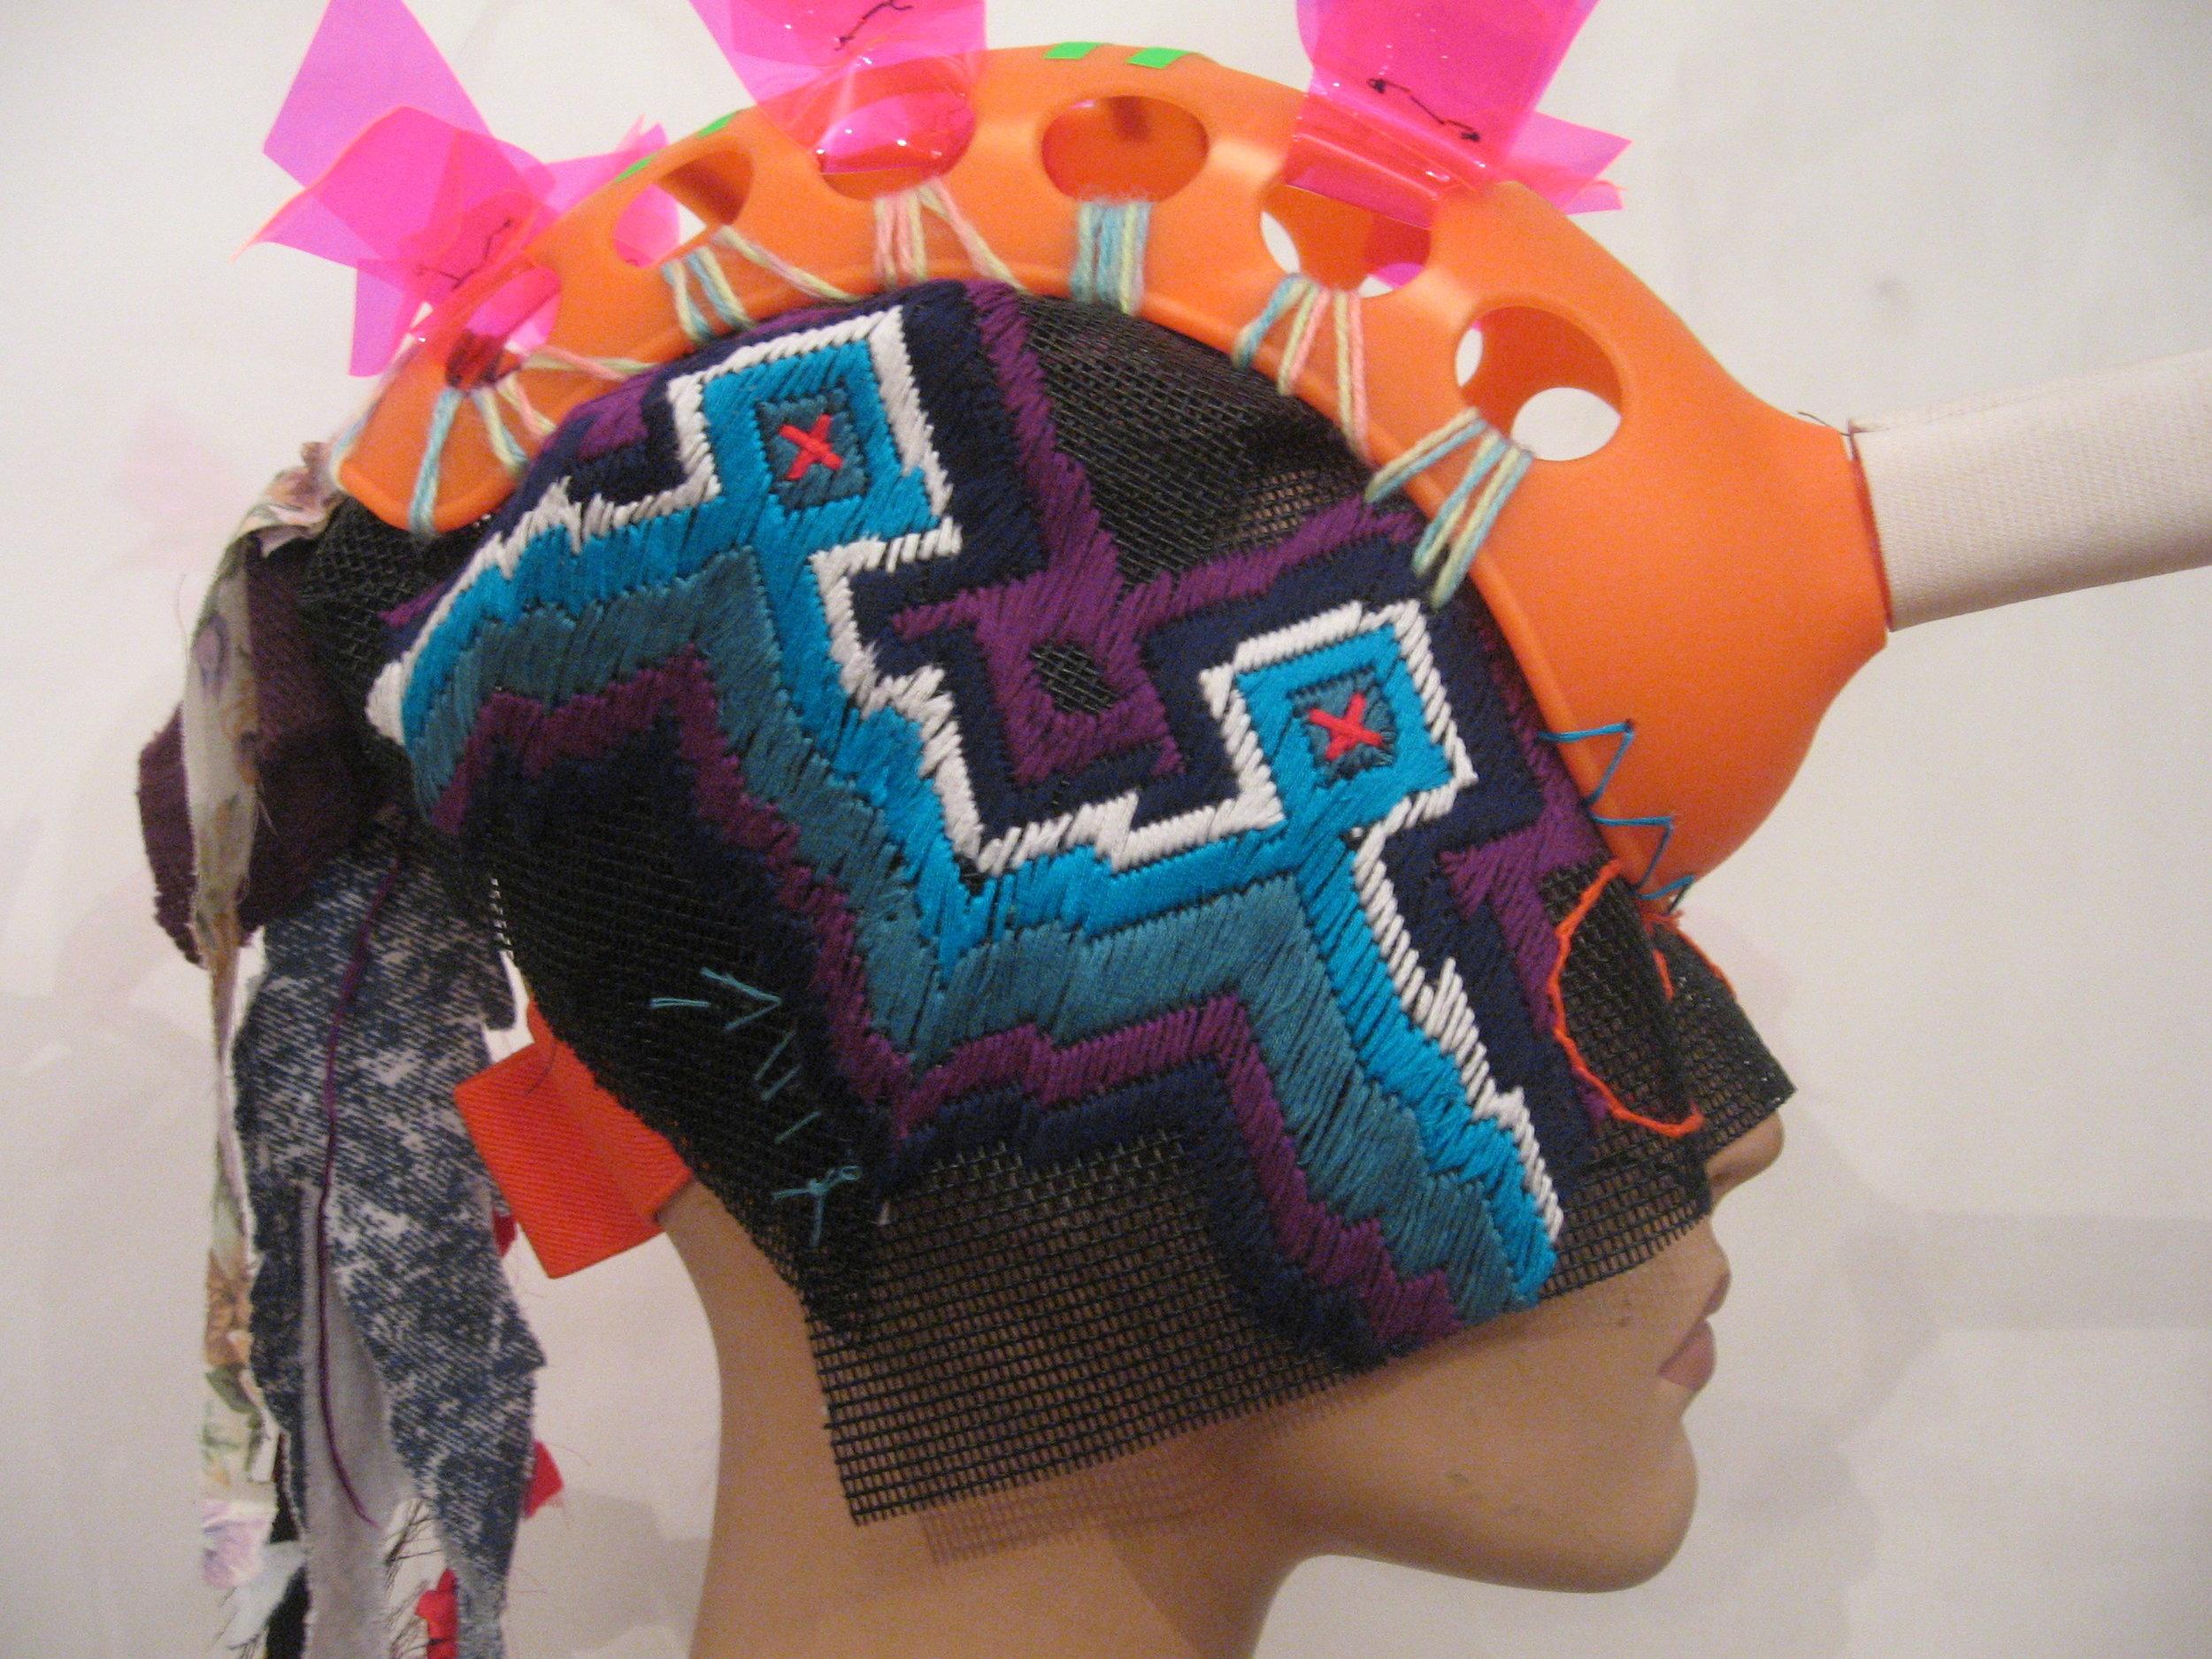 wearable-sculpture-helmet_5060948586_o.jpg